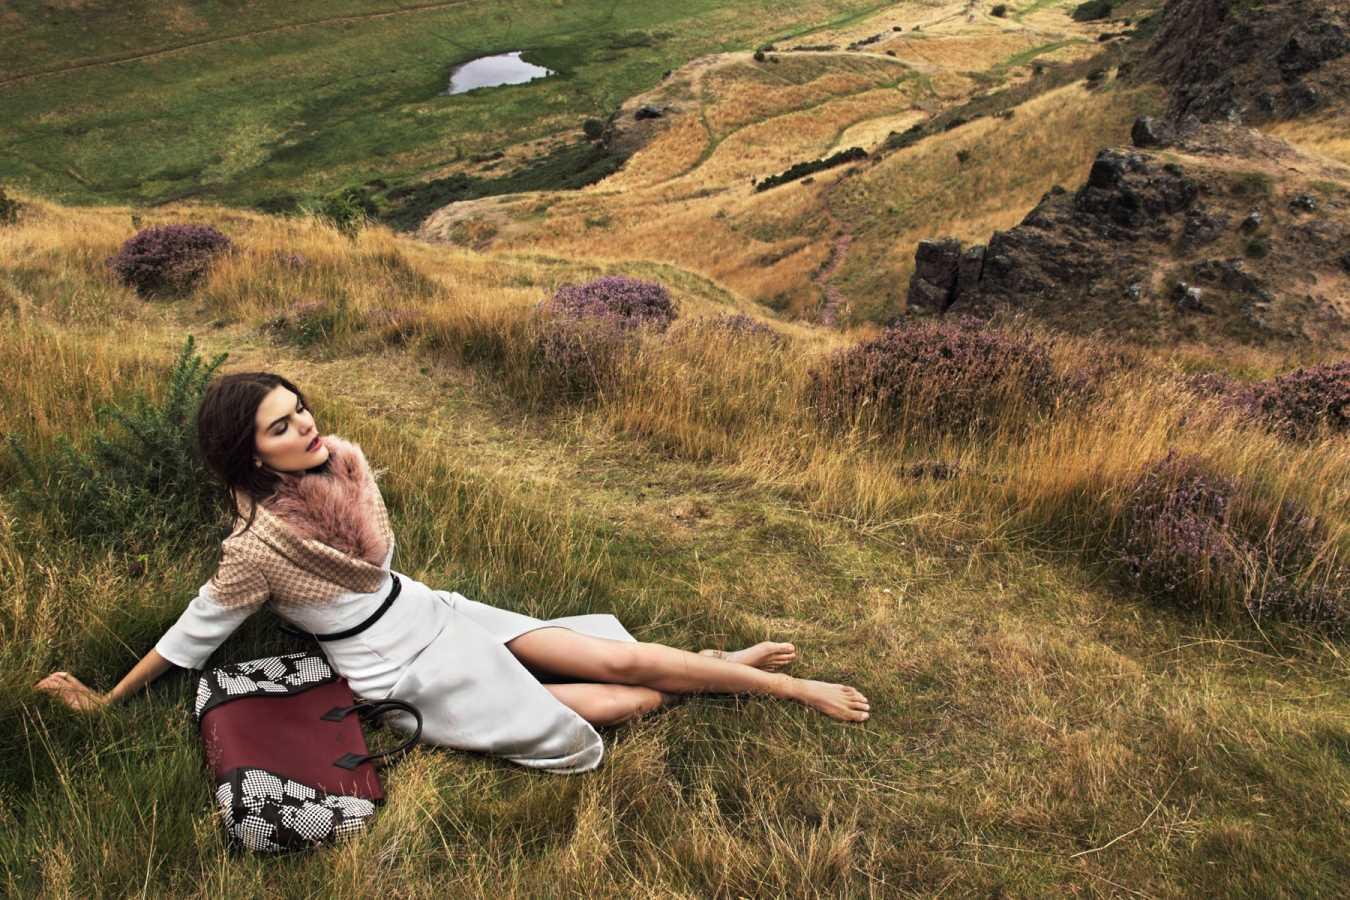 Fashion Photography by Nikolay Biryukov